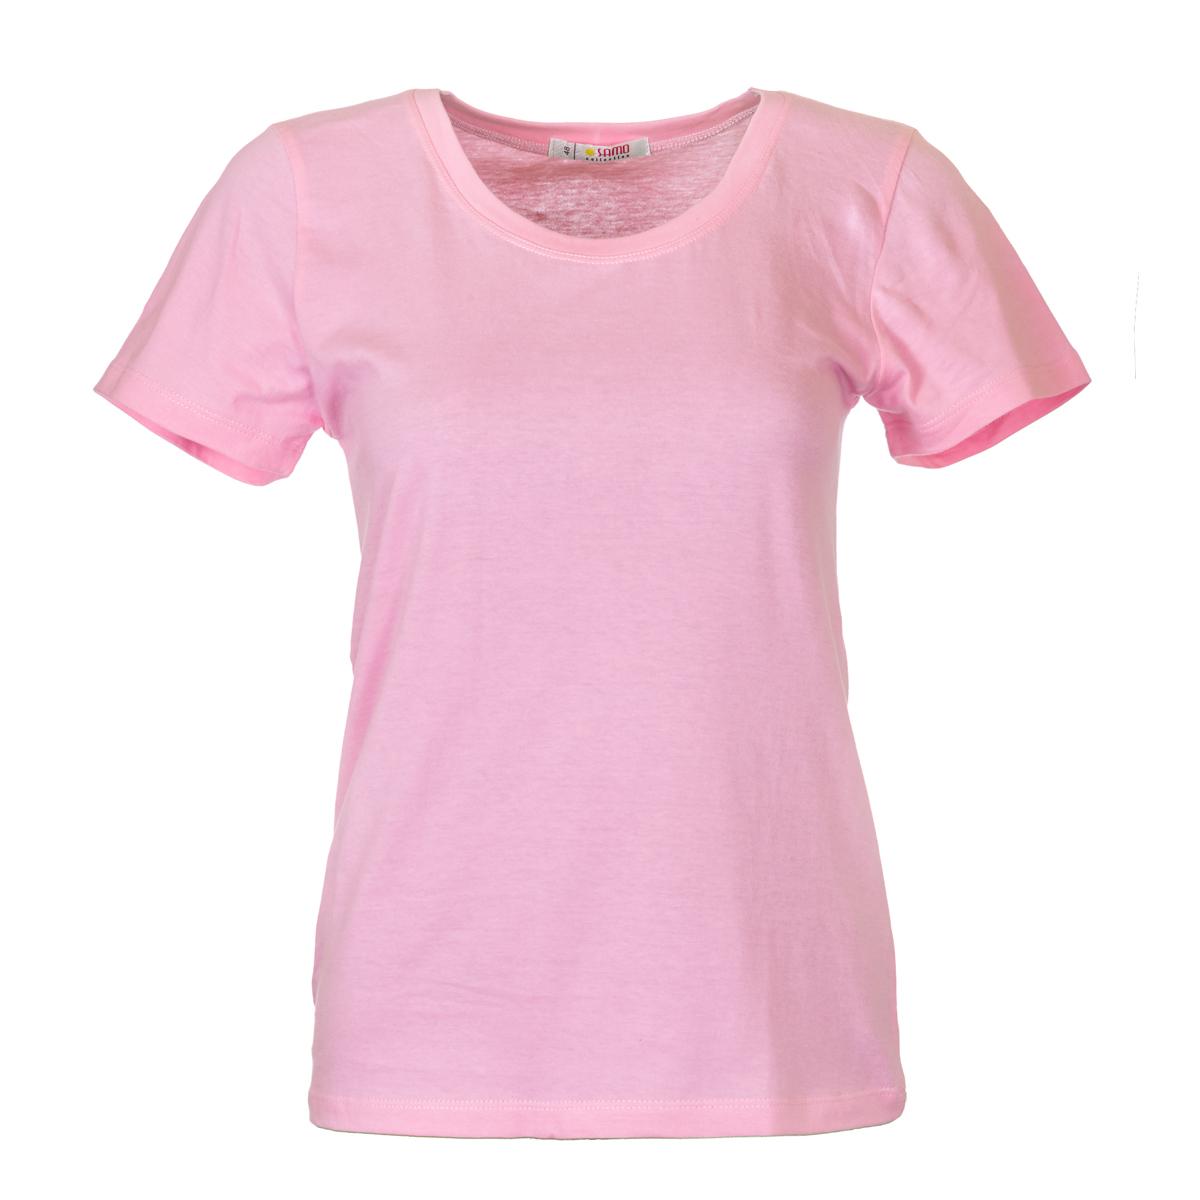 Жен. футболка арт. 04-0045 Розовый р. 48Майки и футболки<br>Фактический ОГ:80 см<br>Фактический ОТ:78 см<br>Фактический ОБ:90 см<br>Длина по спинке:59 см<br>Рост:164-170 см<br><br>Тип: Жен. футболка<br>Размер: 48<br>Материал: Супрем